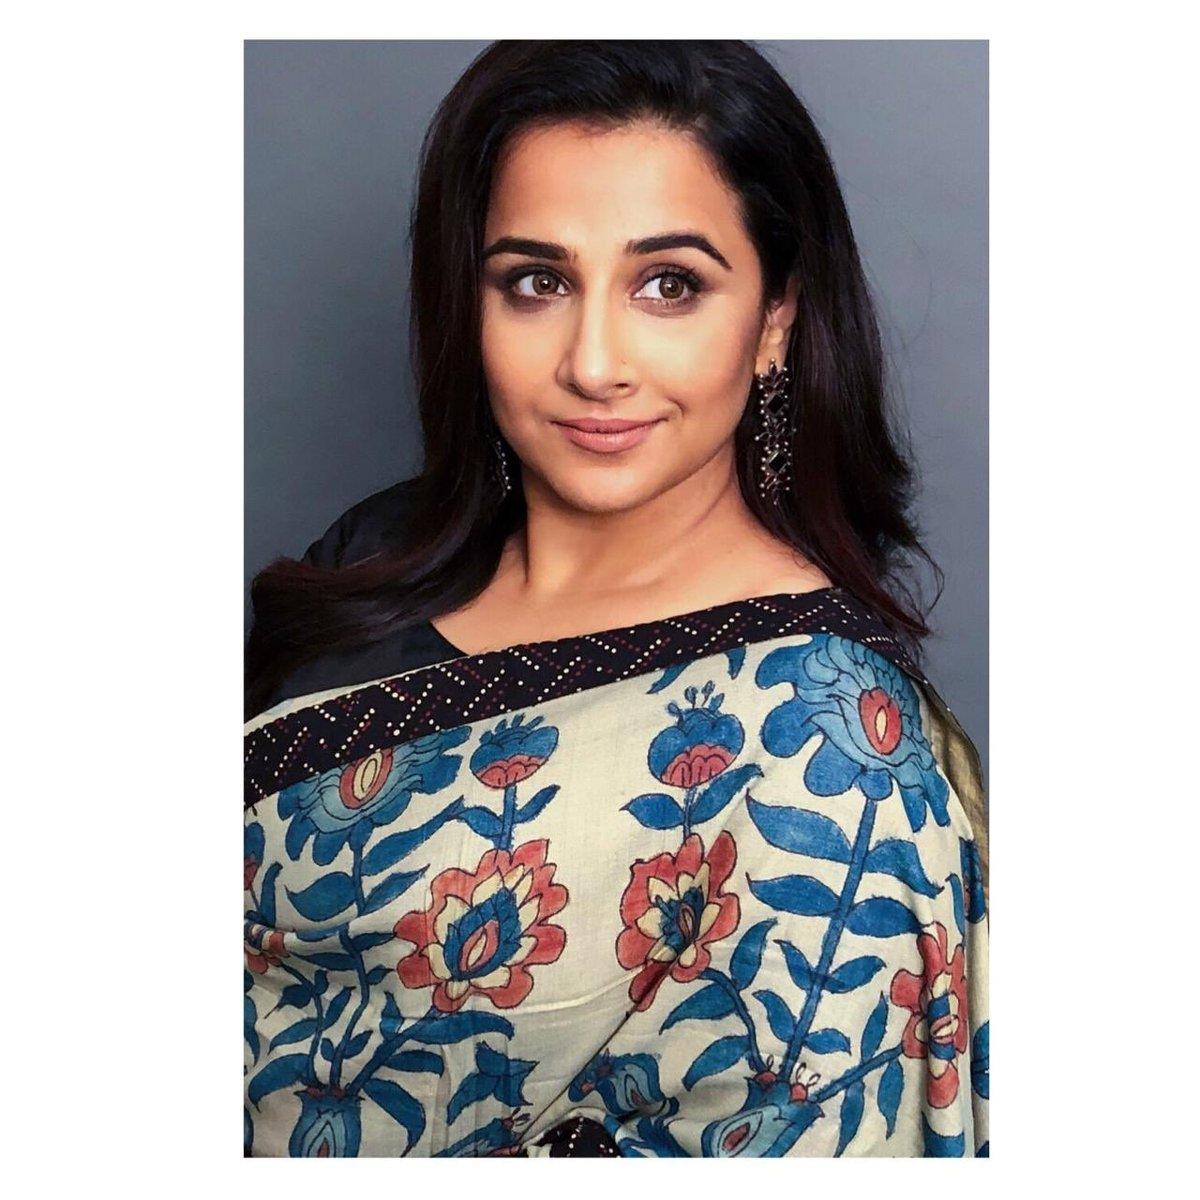 @vidya_balan looking beautiful in the 'Umanga' Kalamkari saree #ayushkejriwal #vidyabalanpic.twitter.com/v7wpX7fLP8